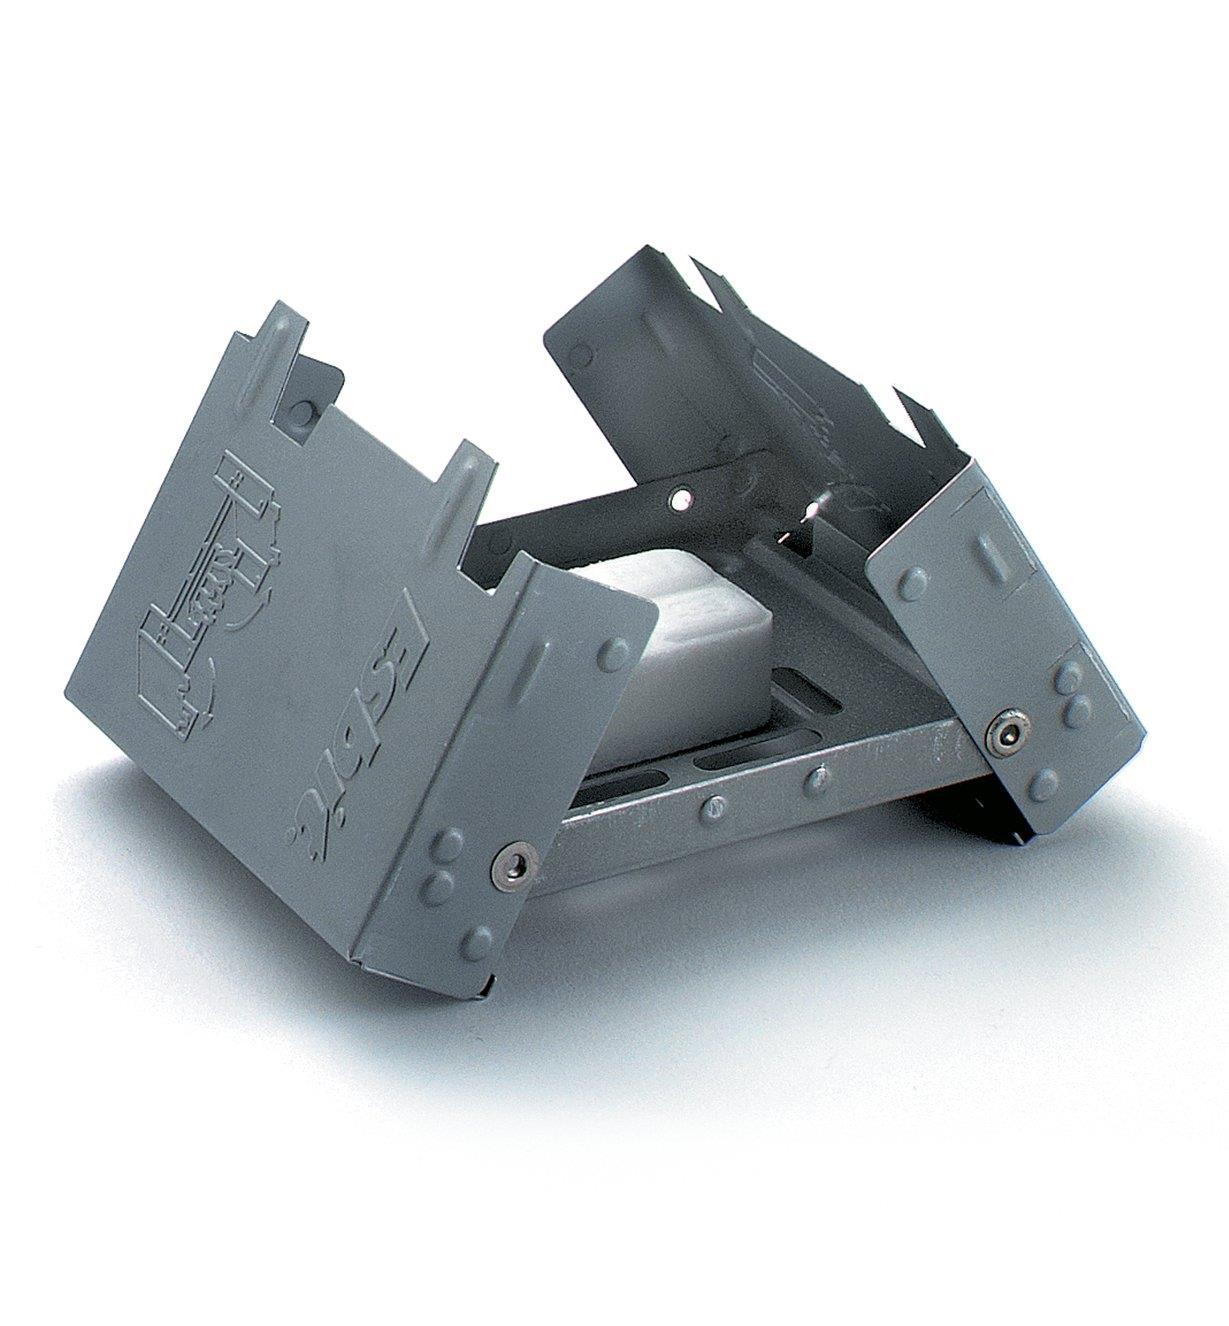 KC306 - Pocket Stove and Fuel